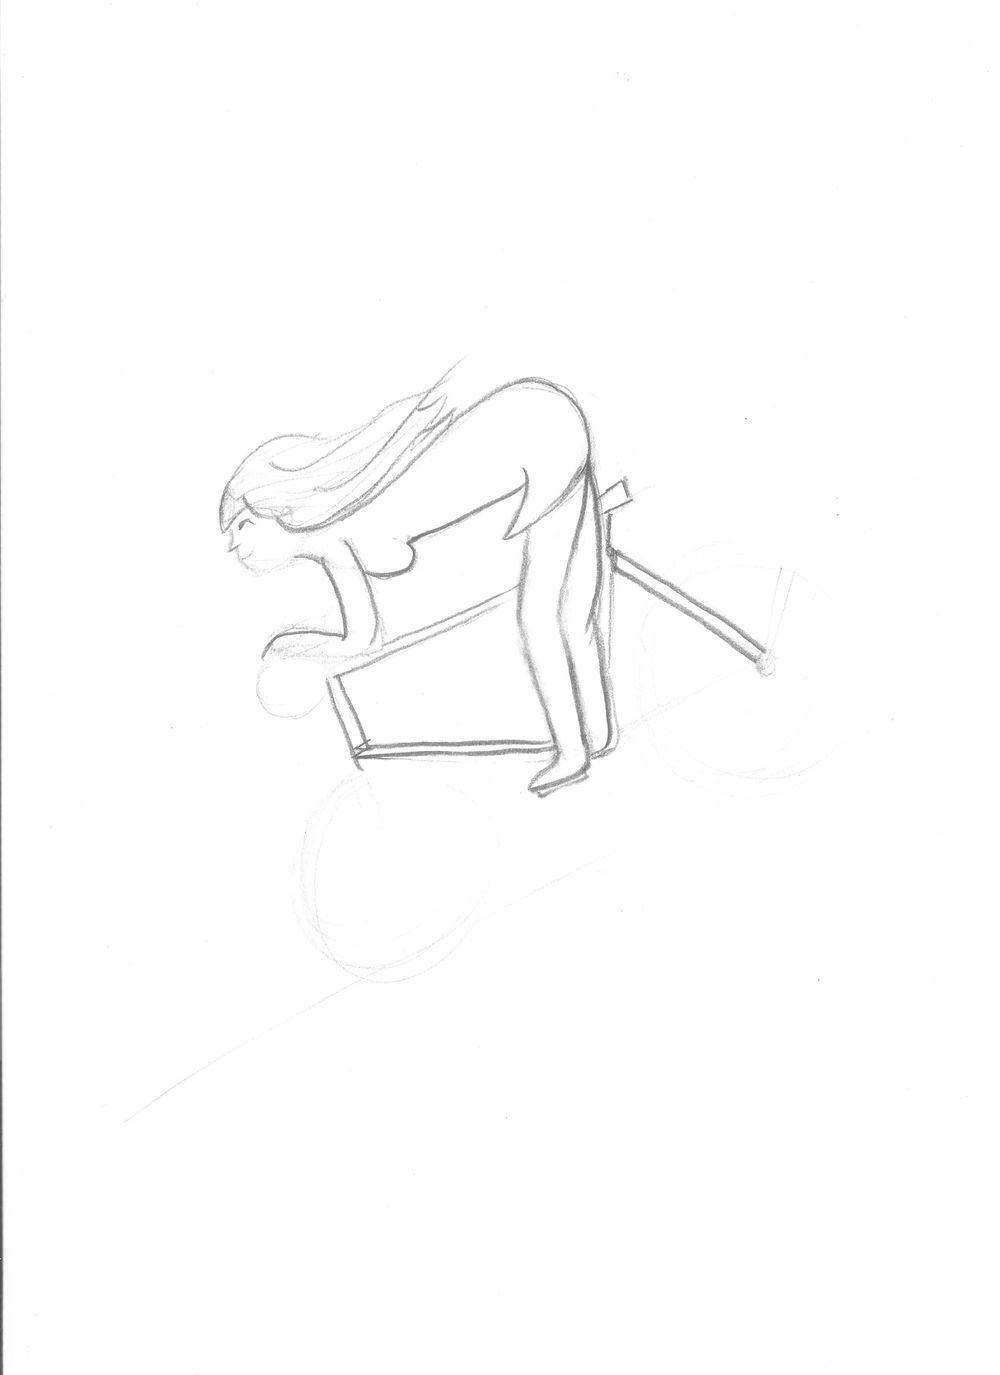 Slope Illustration - image 2 - student project